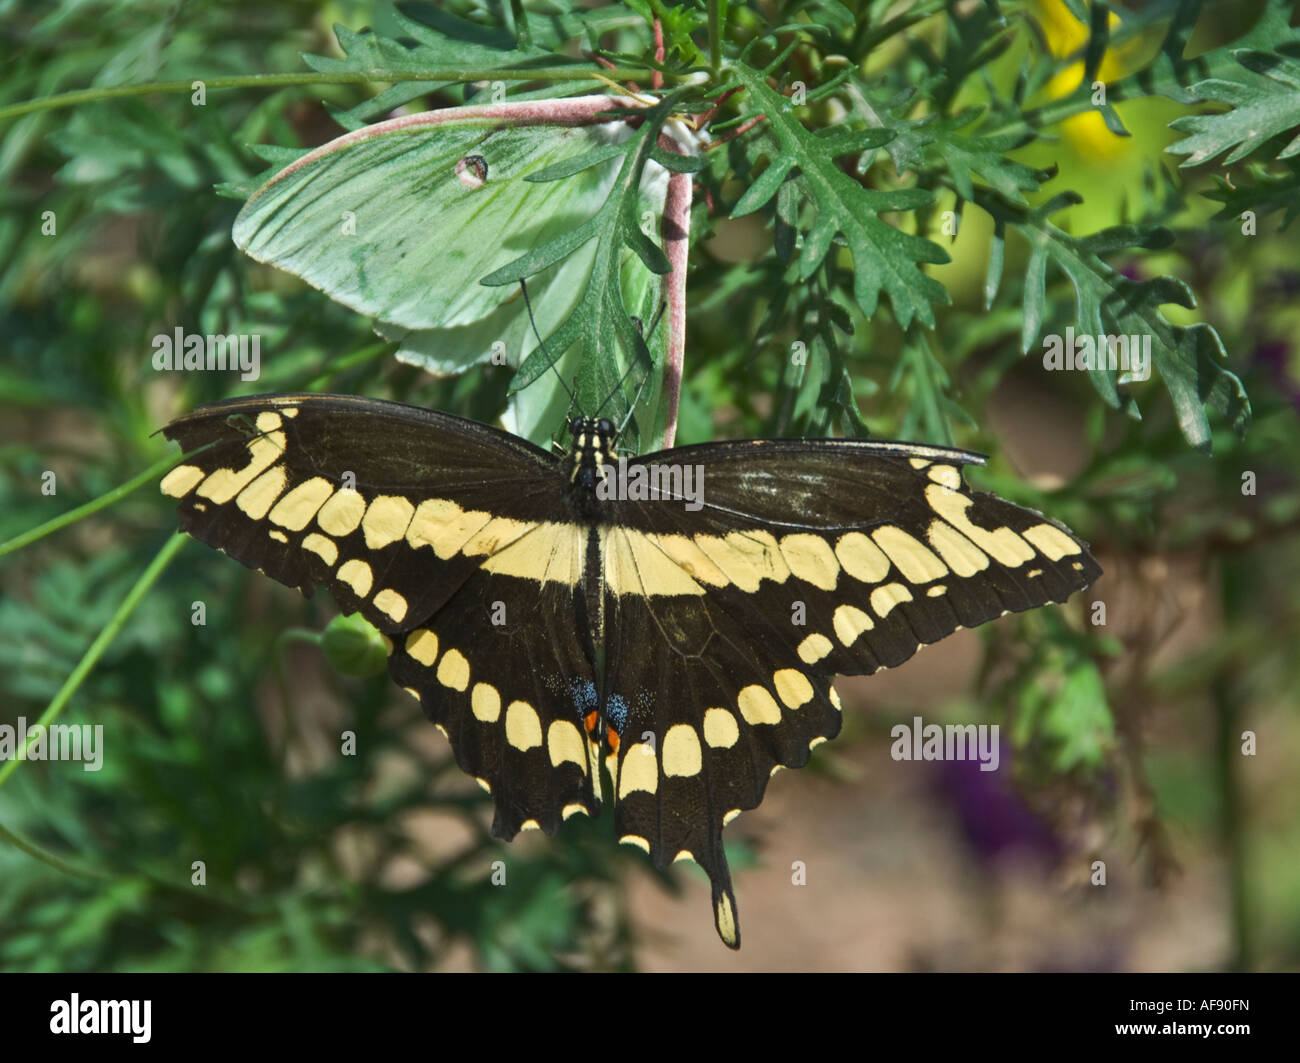 Exceptionnel Arizona Phoenix Desert Botanical Garden Butterfly Garden Green One Is  Nocturnal Lunar Moth